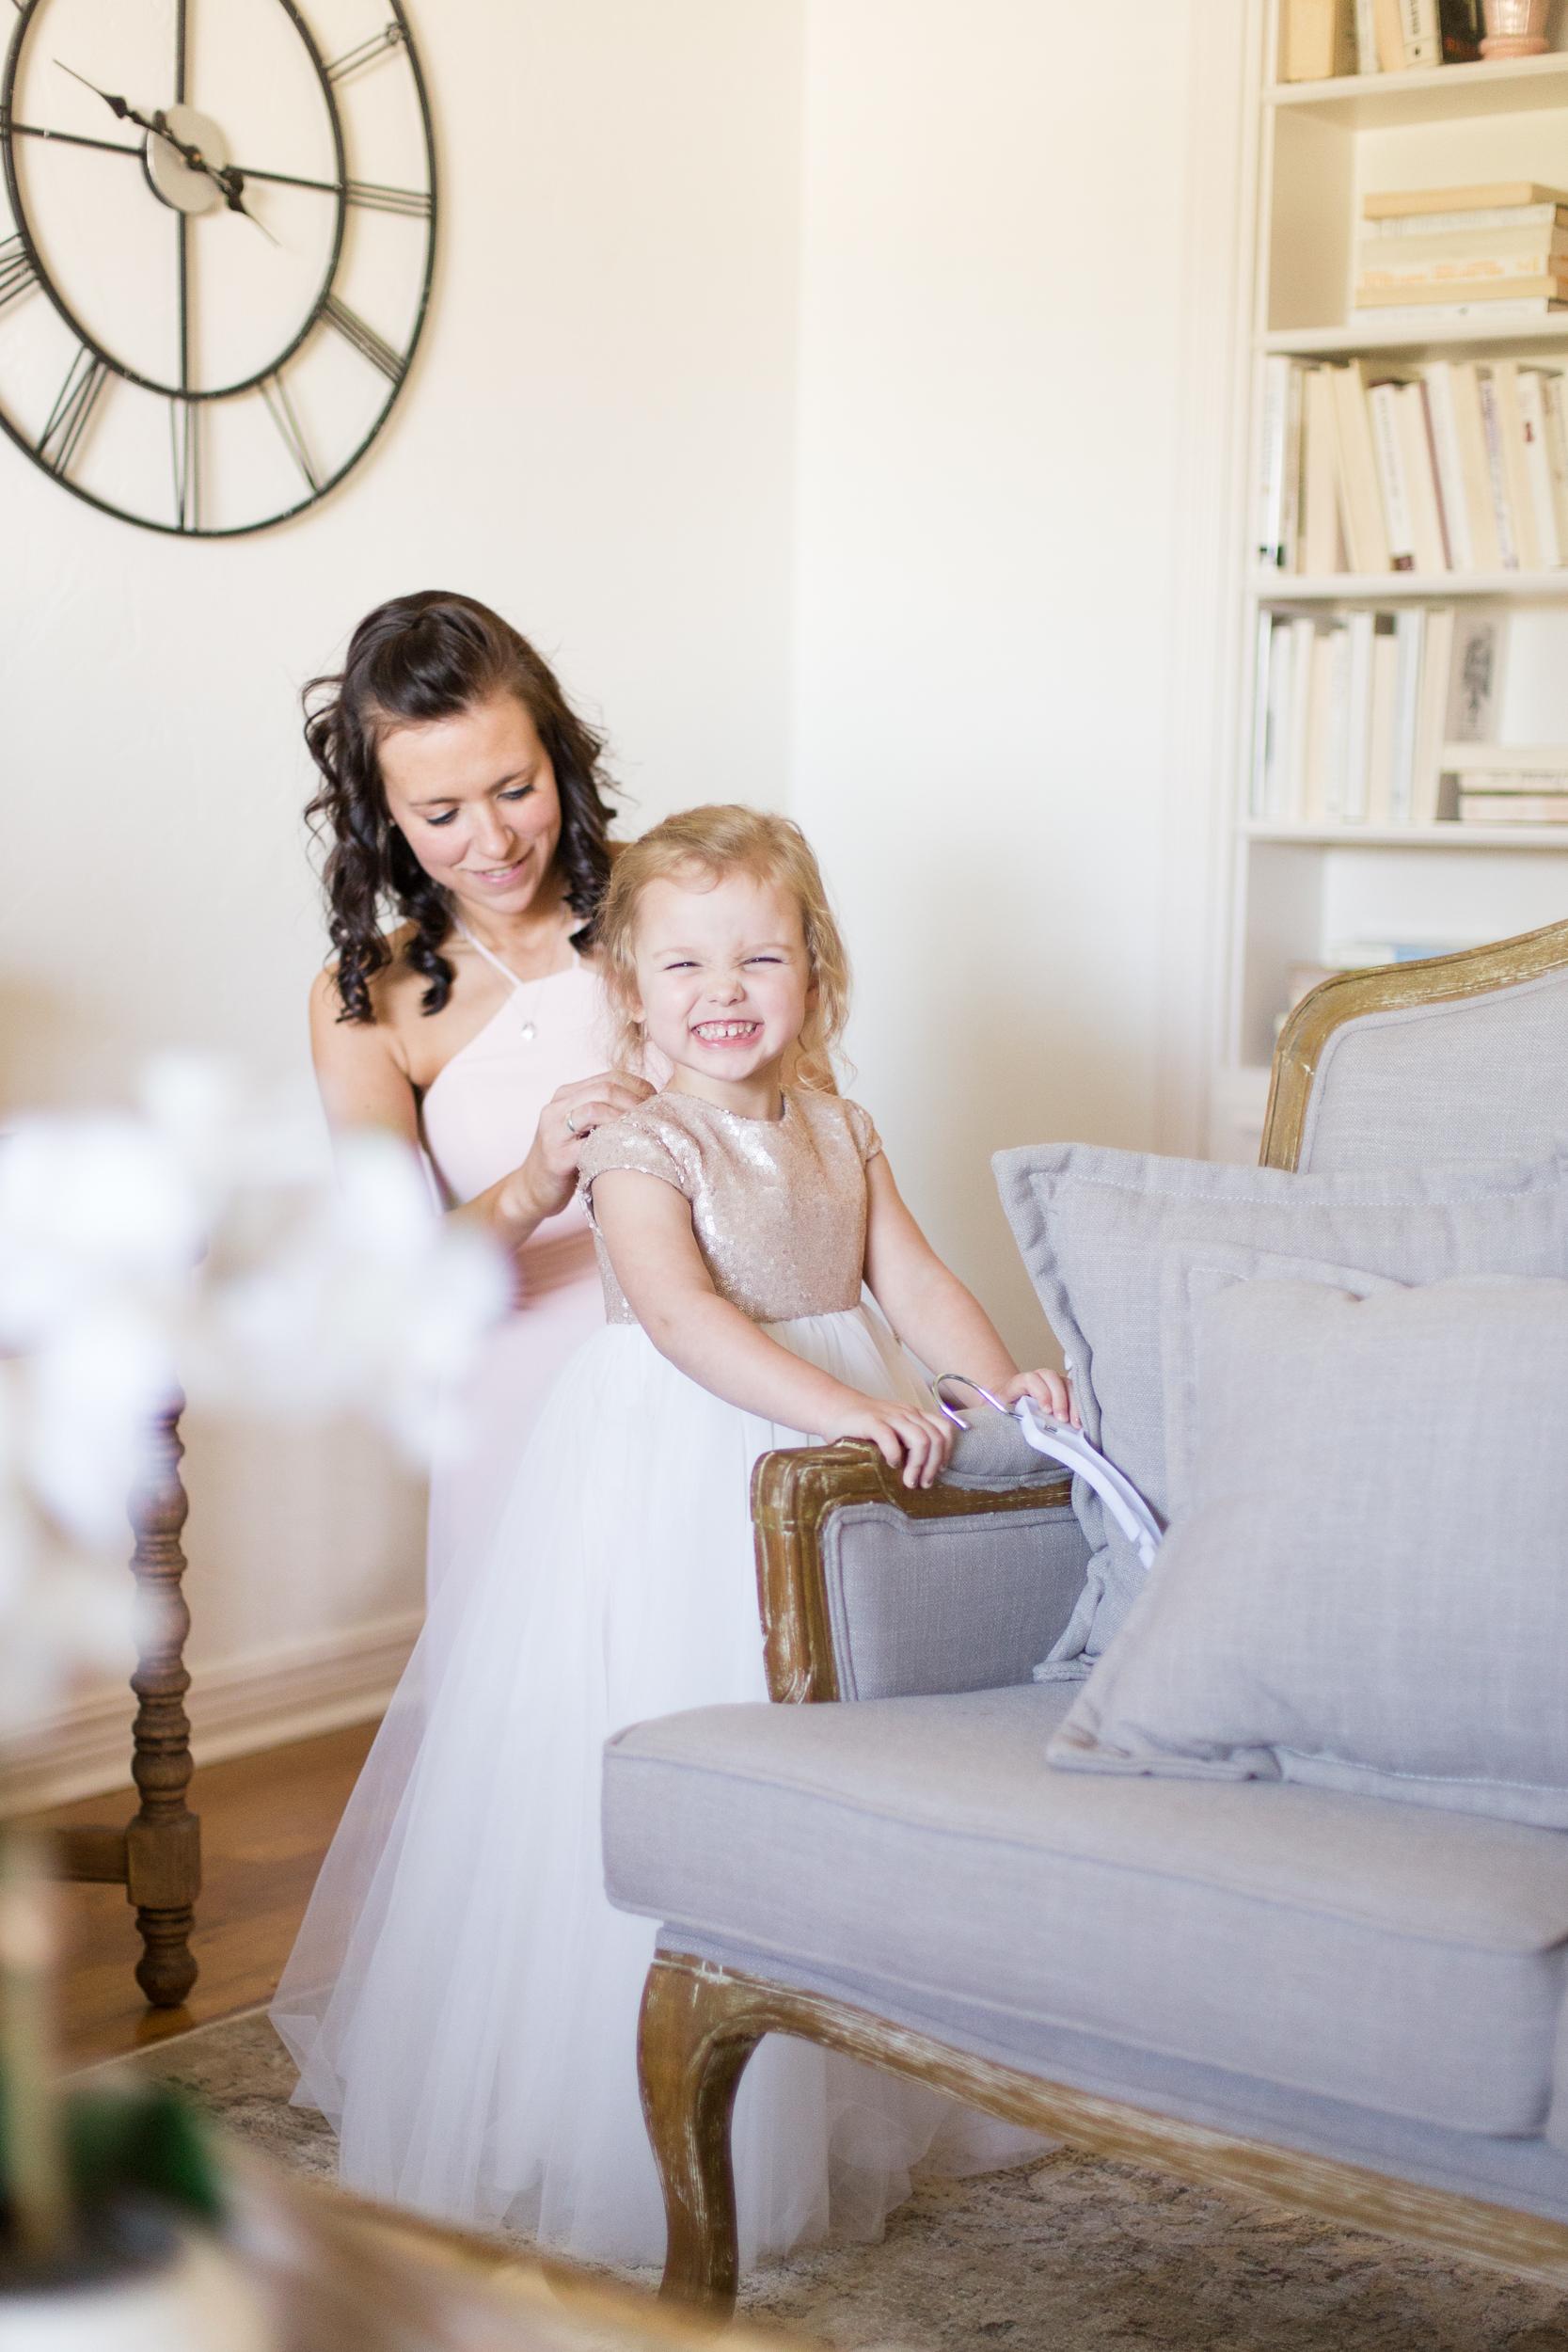 Zihlman-East TX Wedding_Kelsie Hendricks Photography_The Folmar Tyler Texas-92.jpg